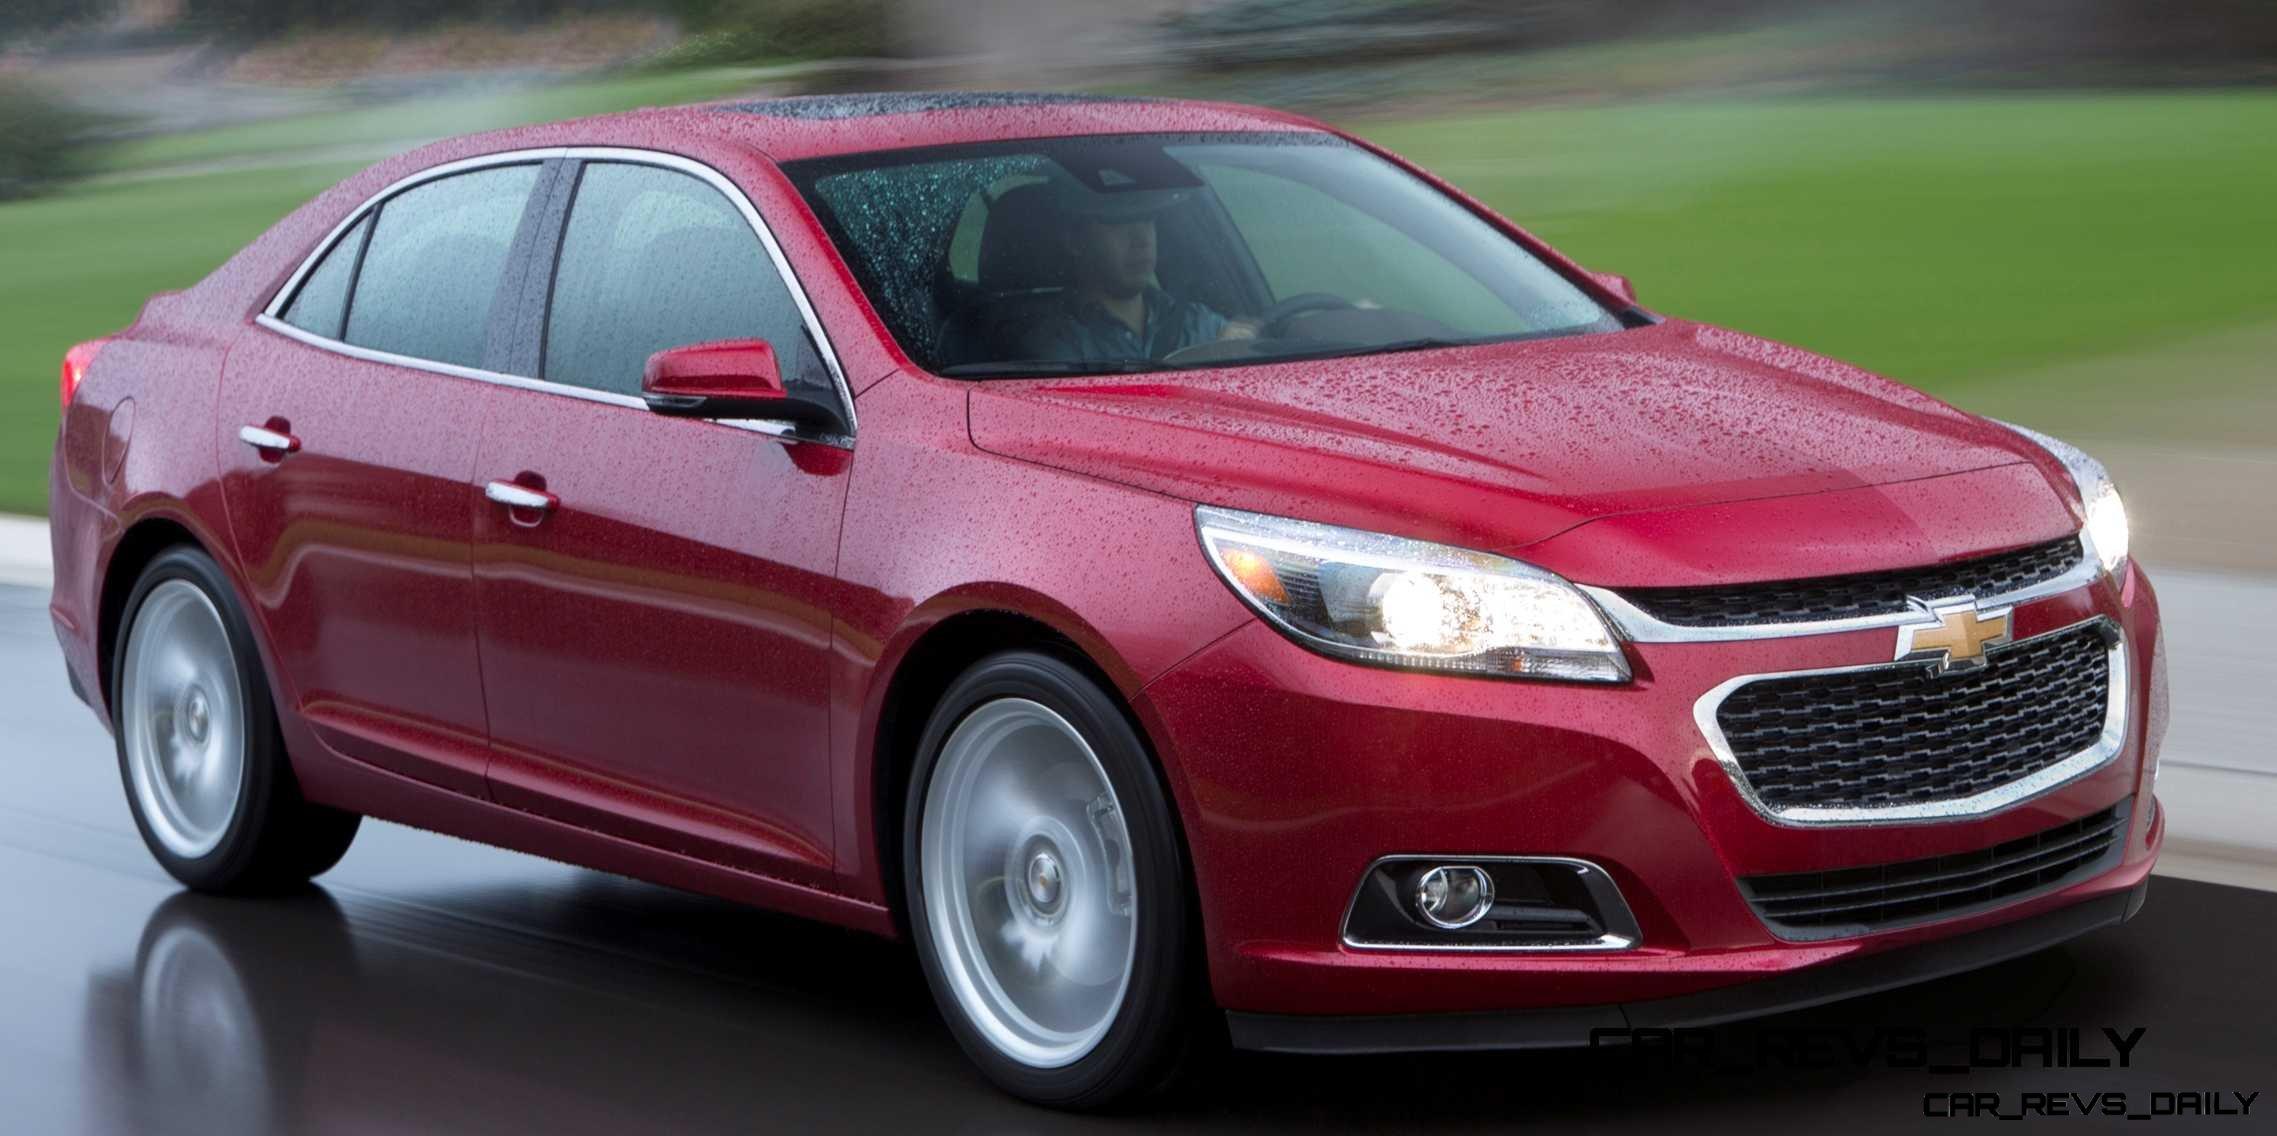 First Drive Videos: 2014 Chevrolet Malibu Turbo - 5.9s to 60 mph!?